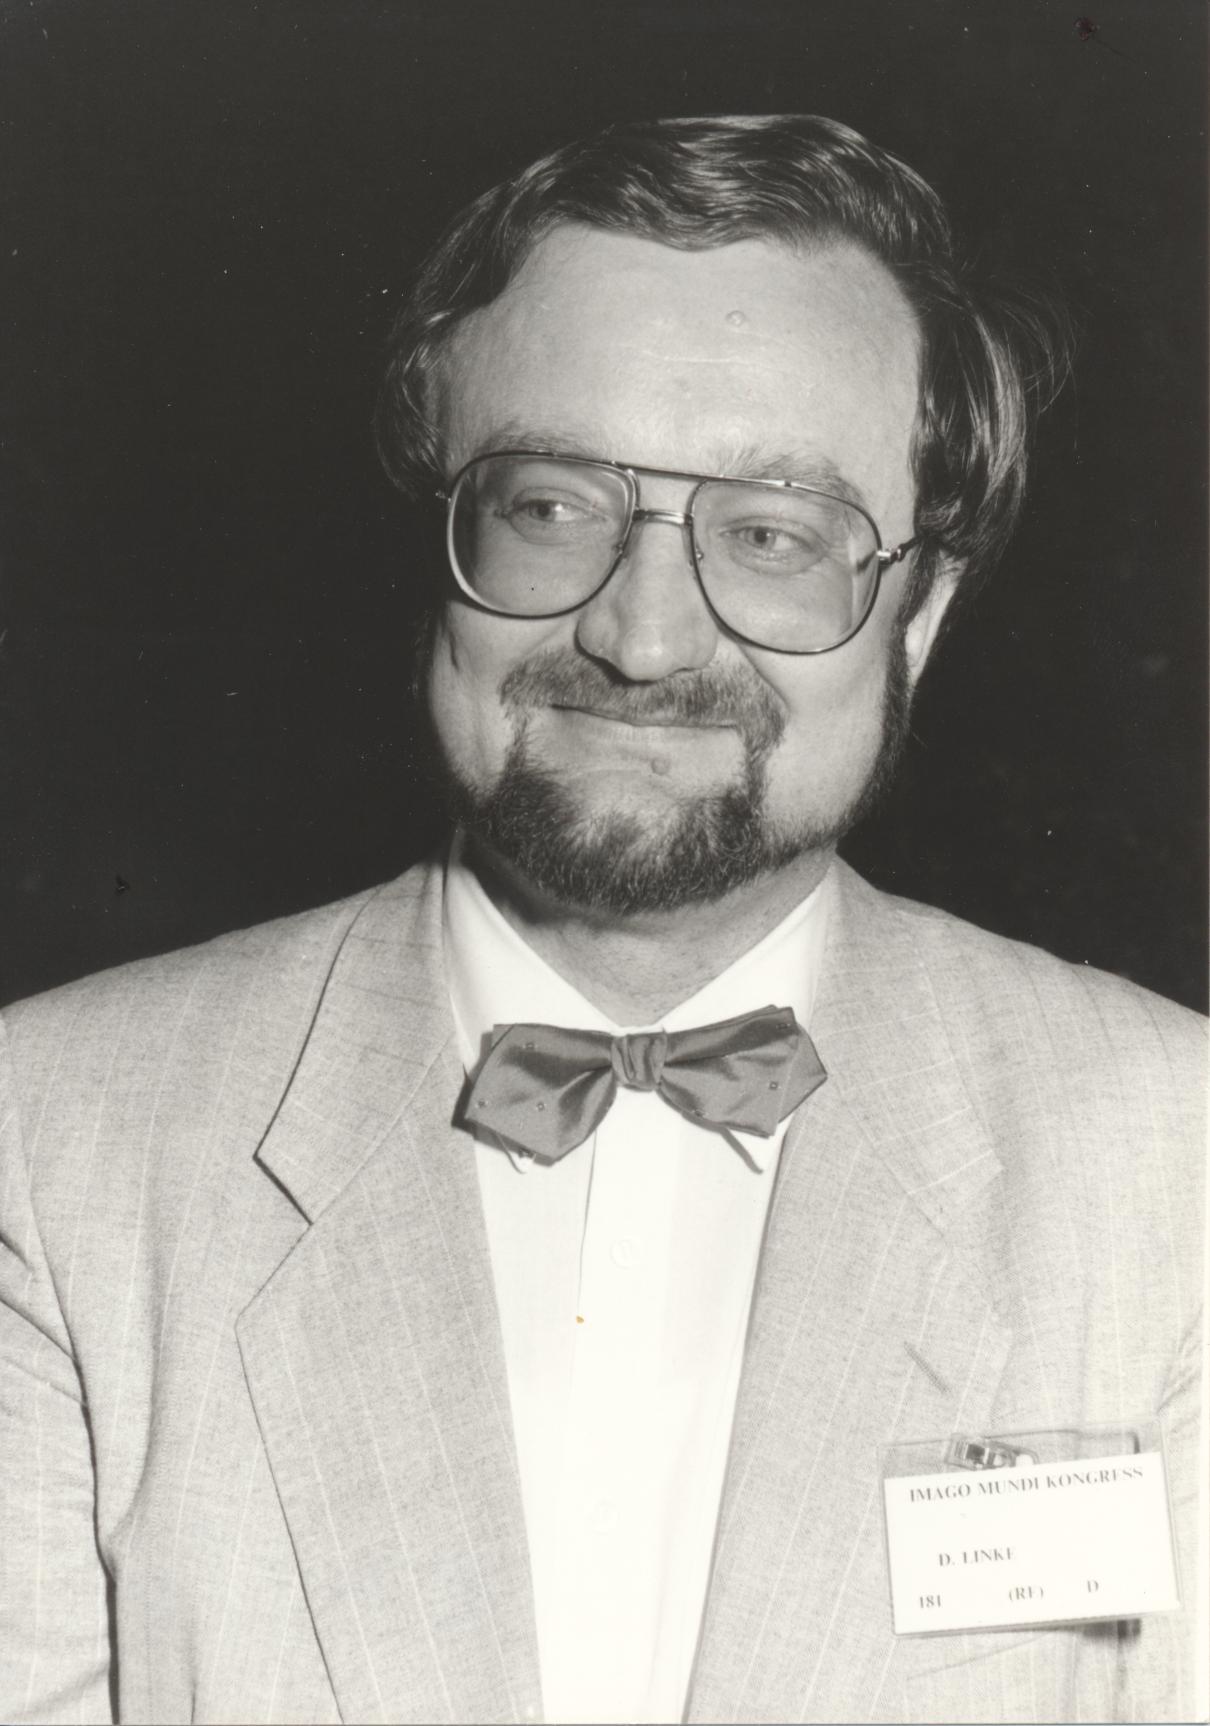 XII. Imago Mundi-Kongress 1989, Innsbruck, Prof. Dr. Detlef Bernhard Linke